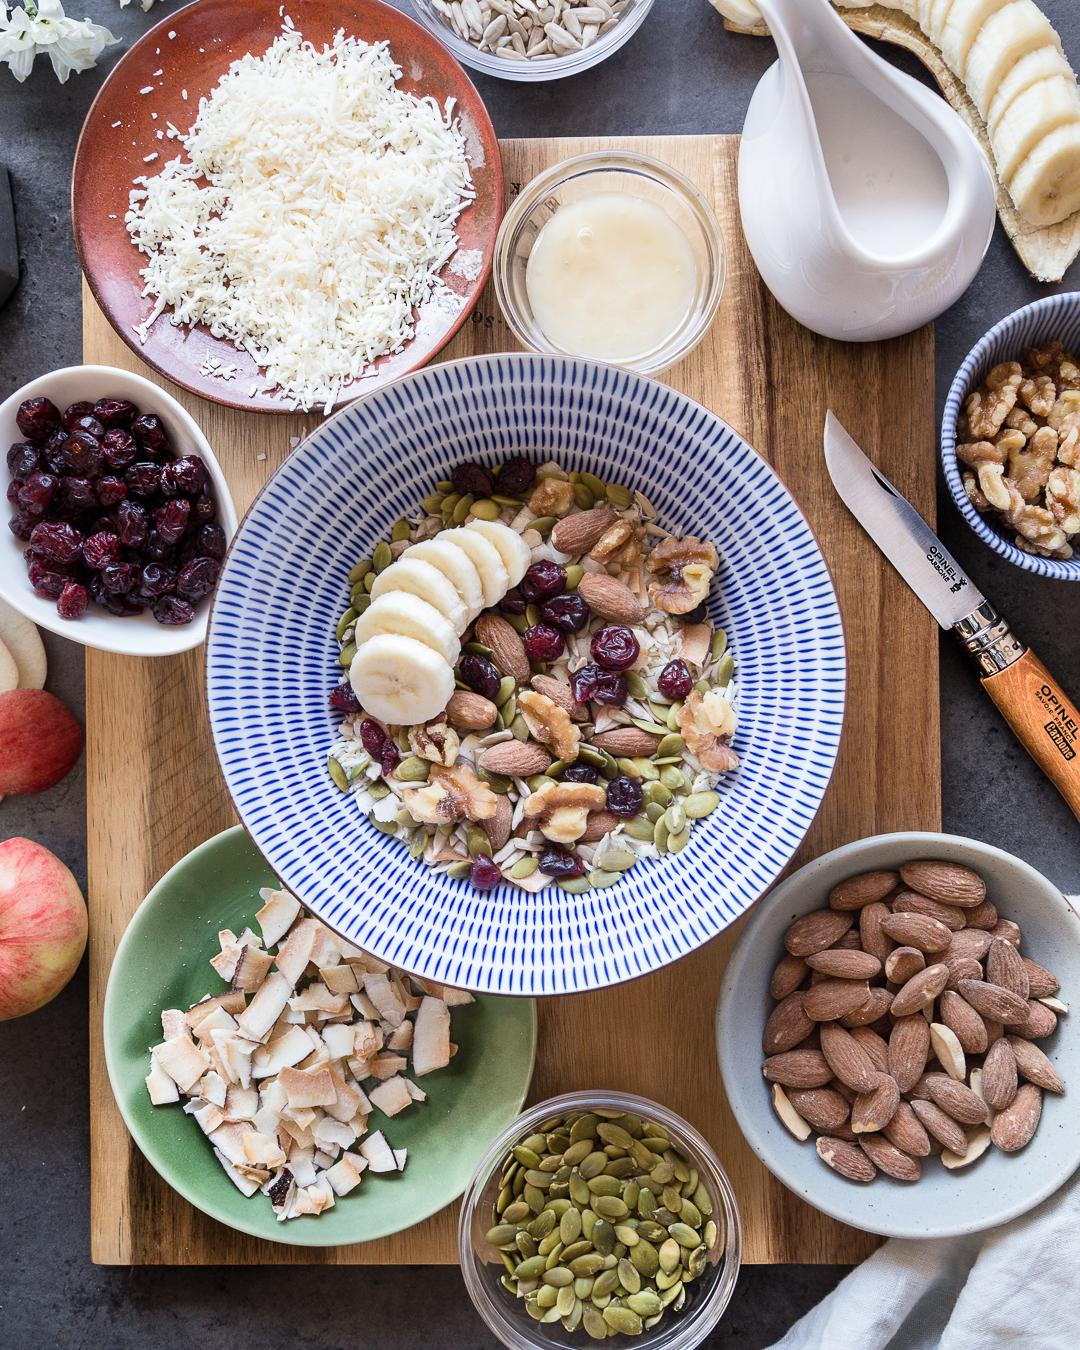 Paleo Granola Primal Gourmet Whole30 Easy Recipe